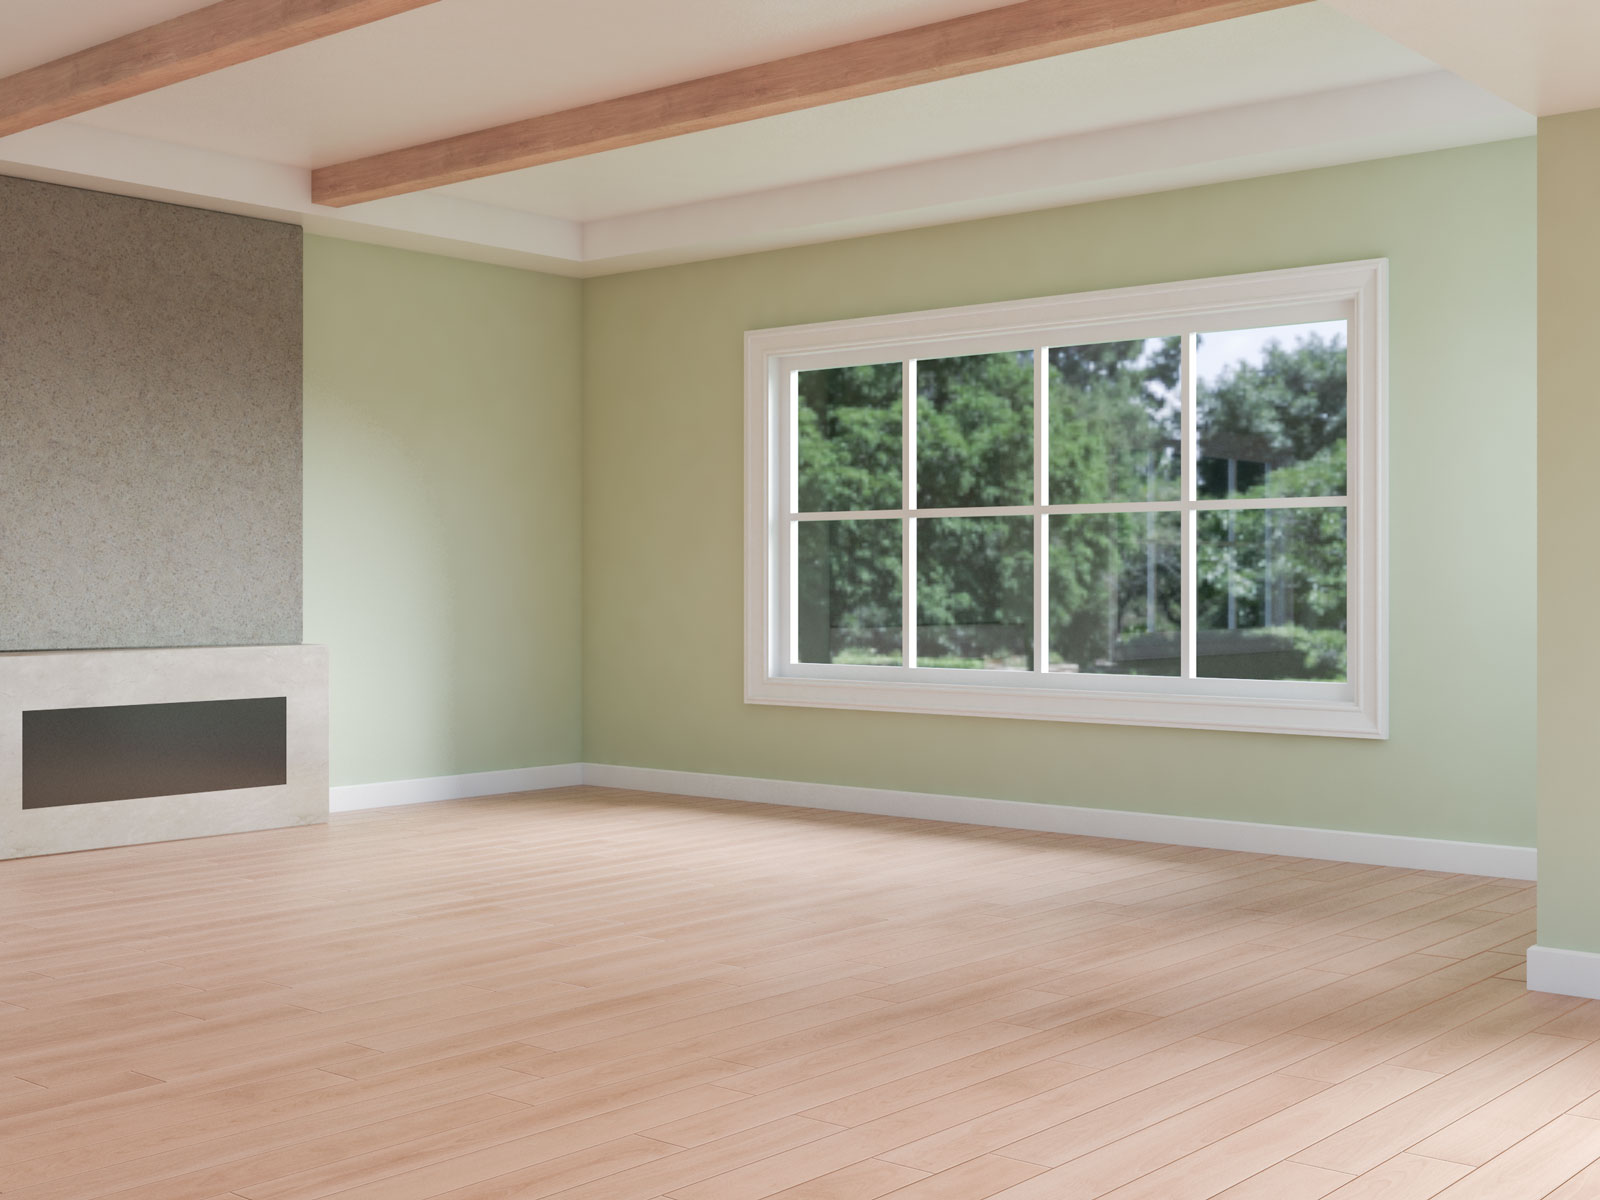 Sage walls with oak flooring